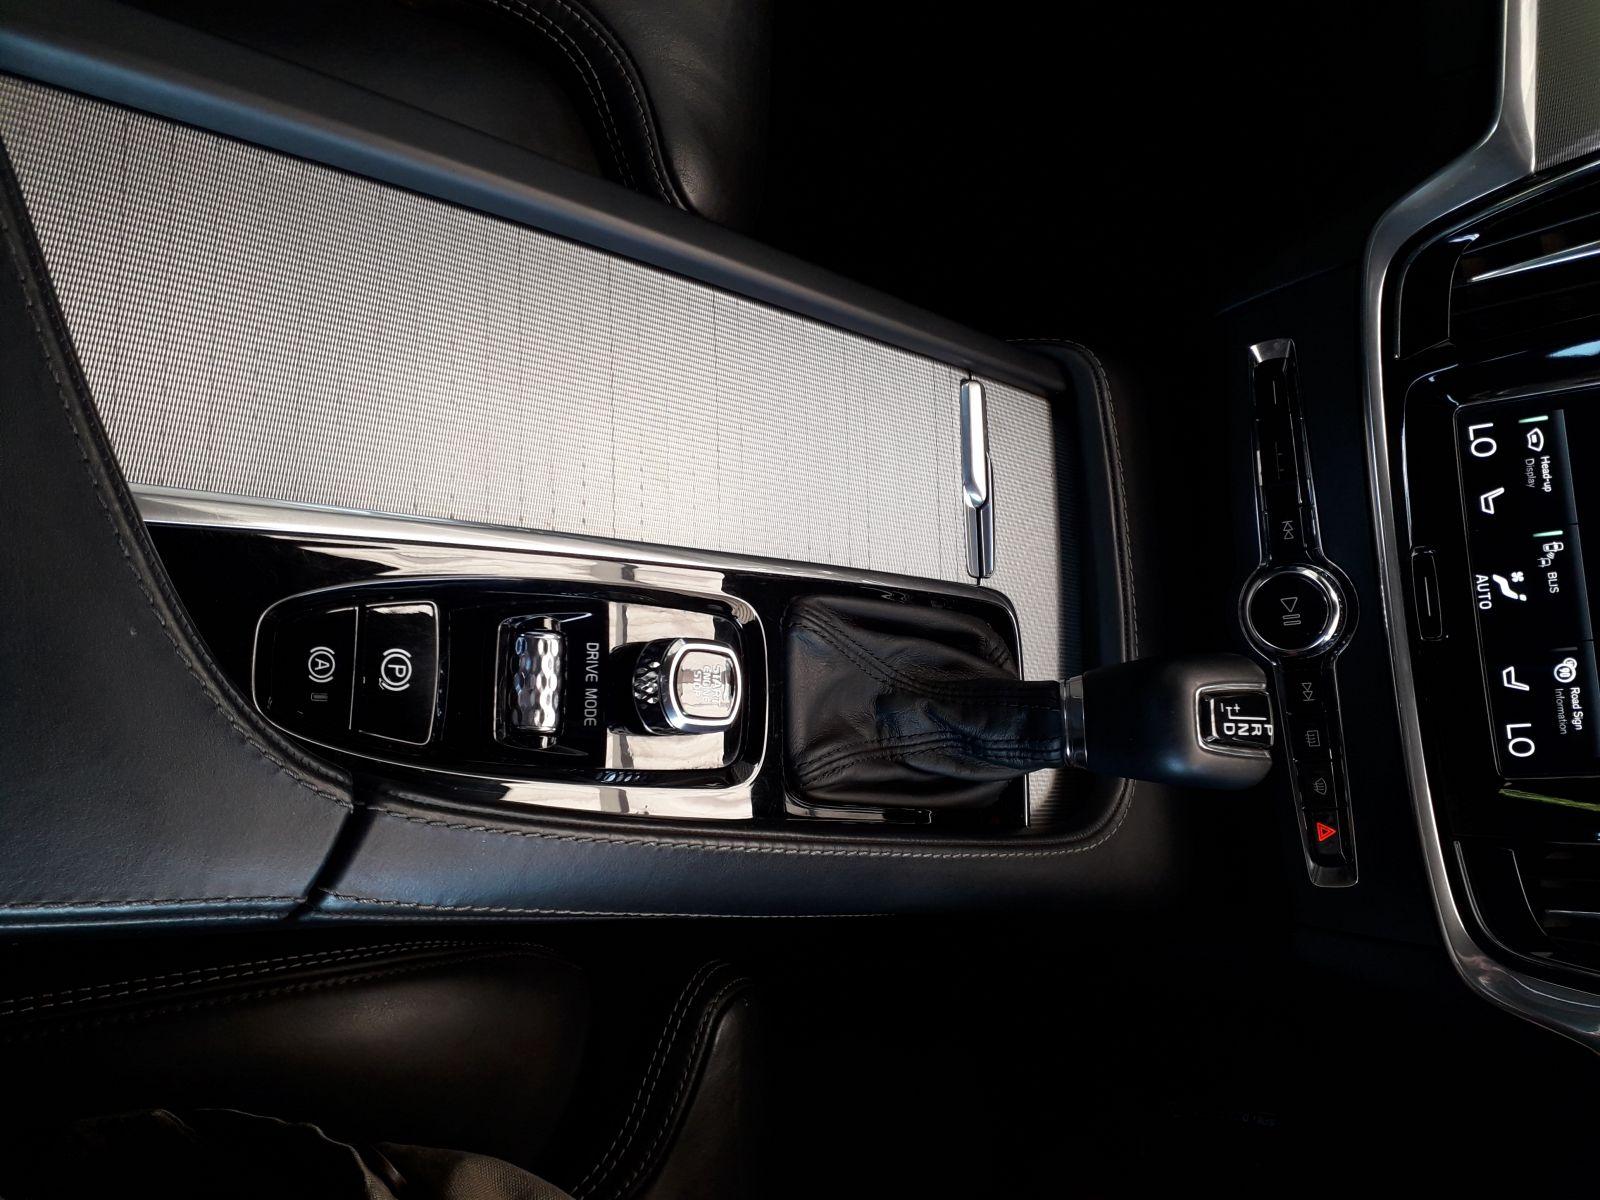 2018 VOLVO 960 / S80 / S90 /V90 S90 D5 INSCRIPTION GEARTRONIC AWD